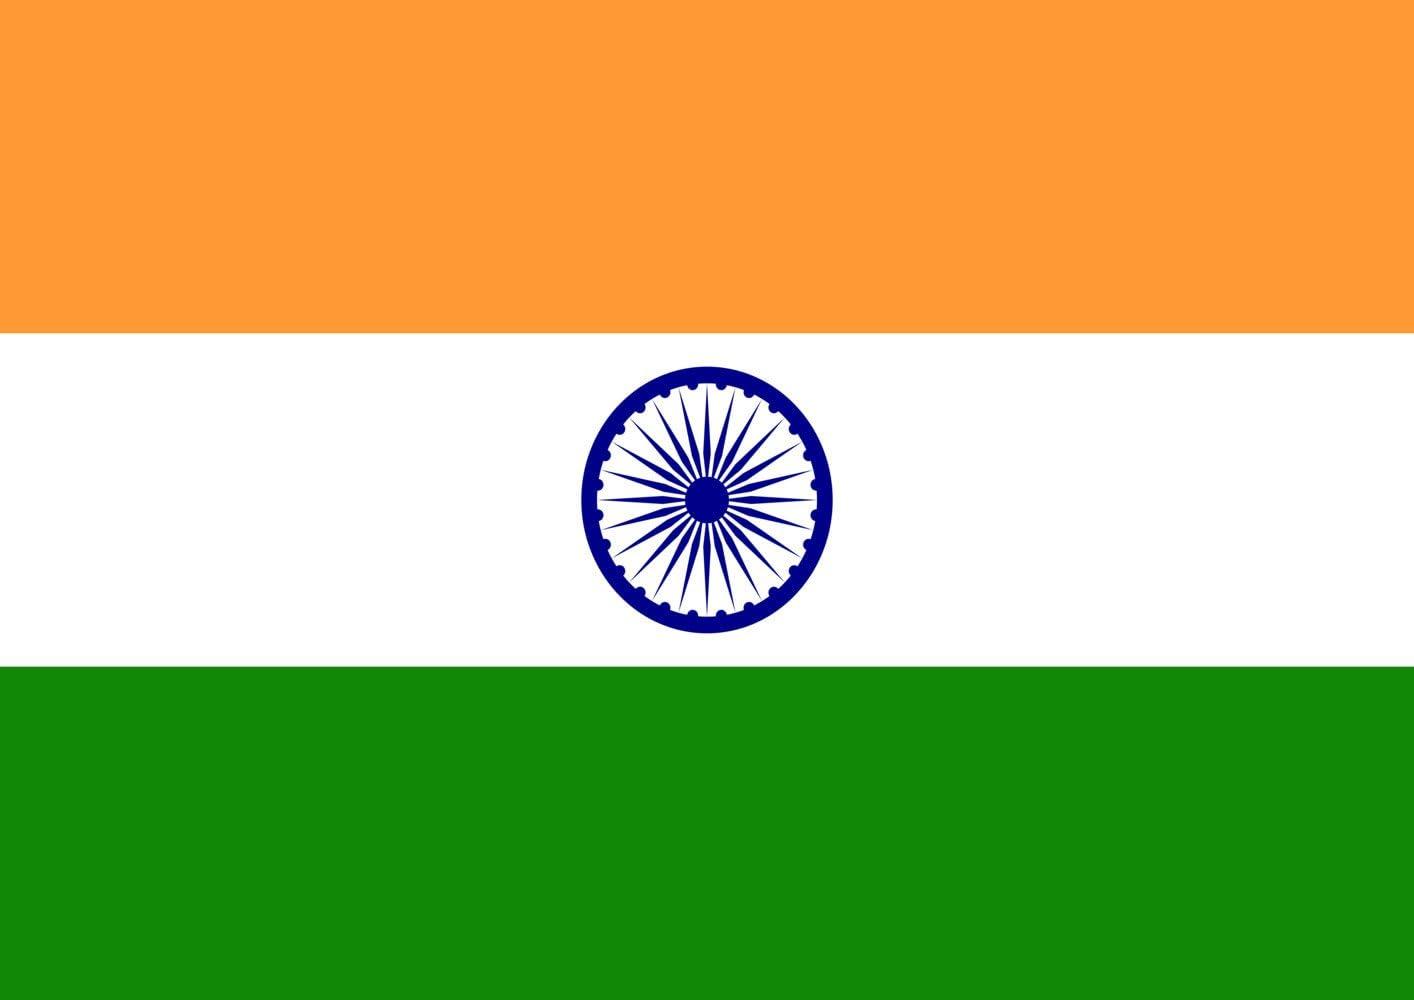 Toland Home Garden Flag of India 12.5 x 18 Inch Decorative Country Nation Garden Flag